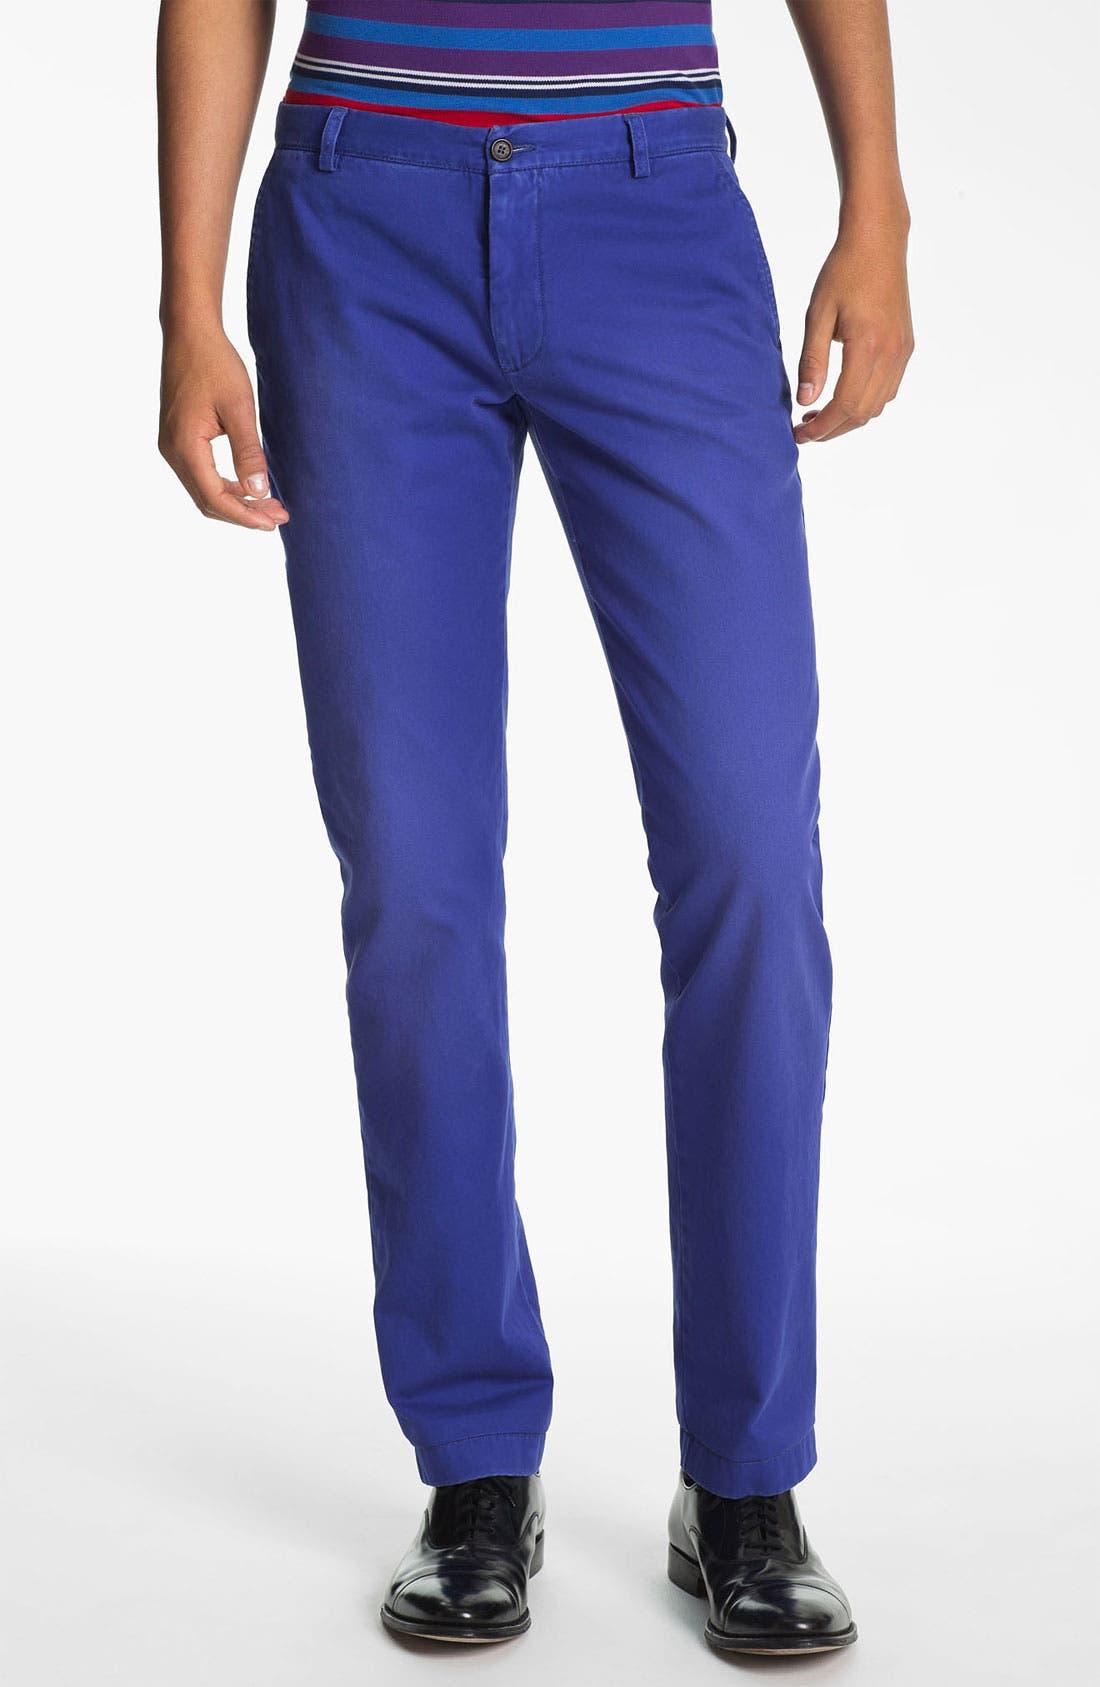 Alternate Image 1 Selected - Etro 'Cuba Sabbiato' Slim Fit Pants